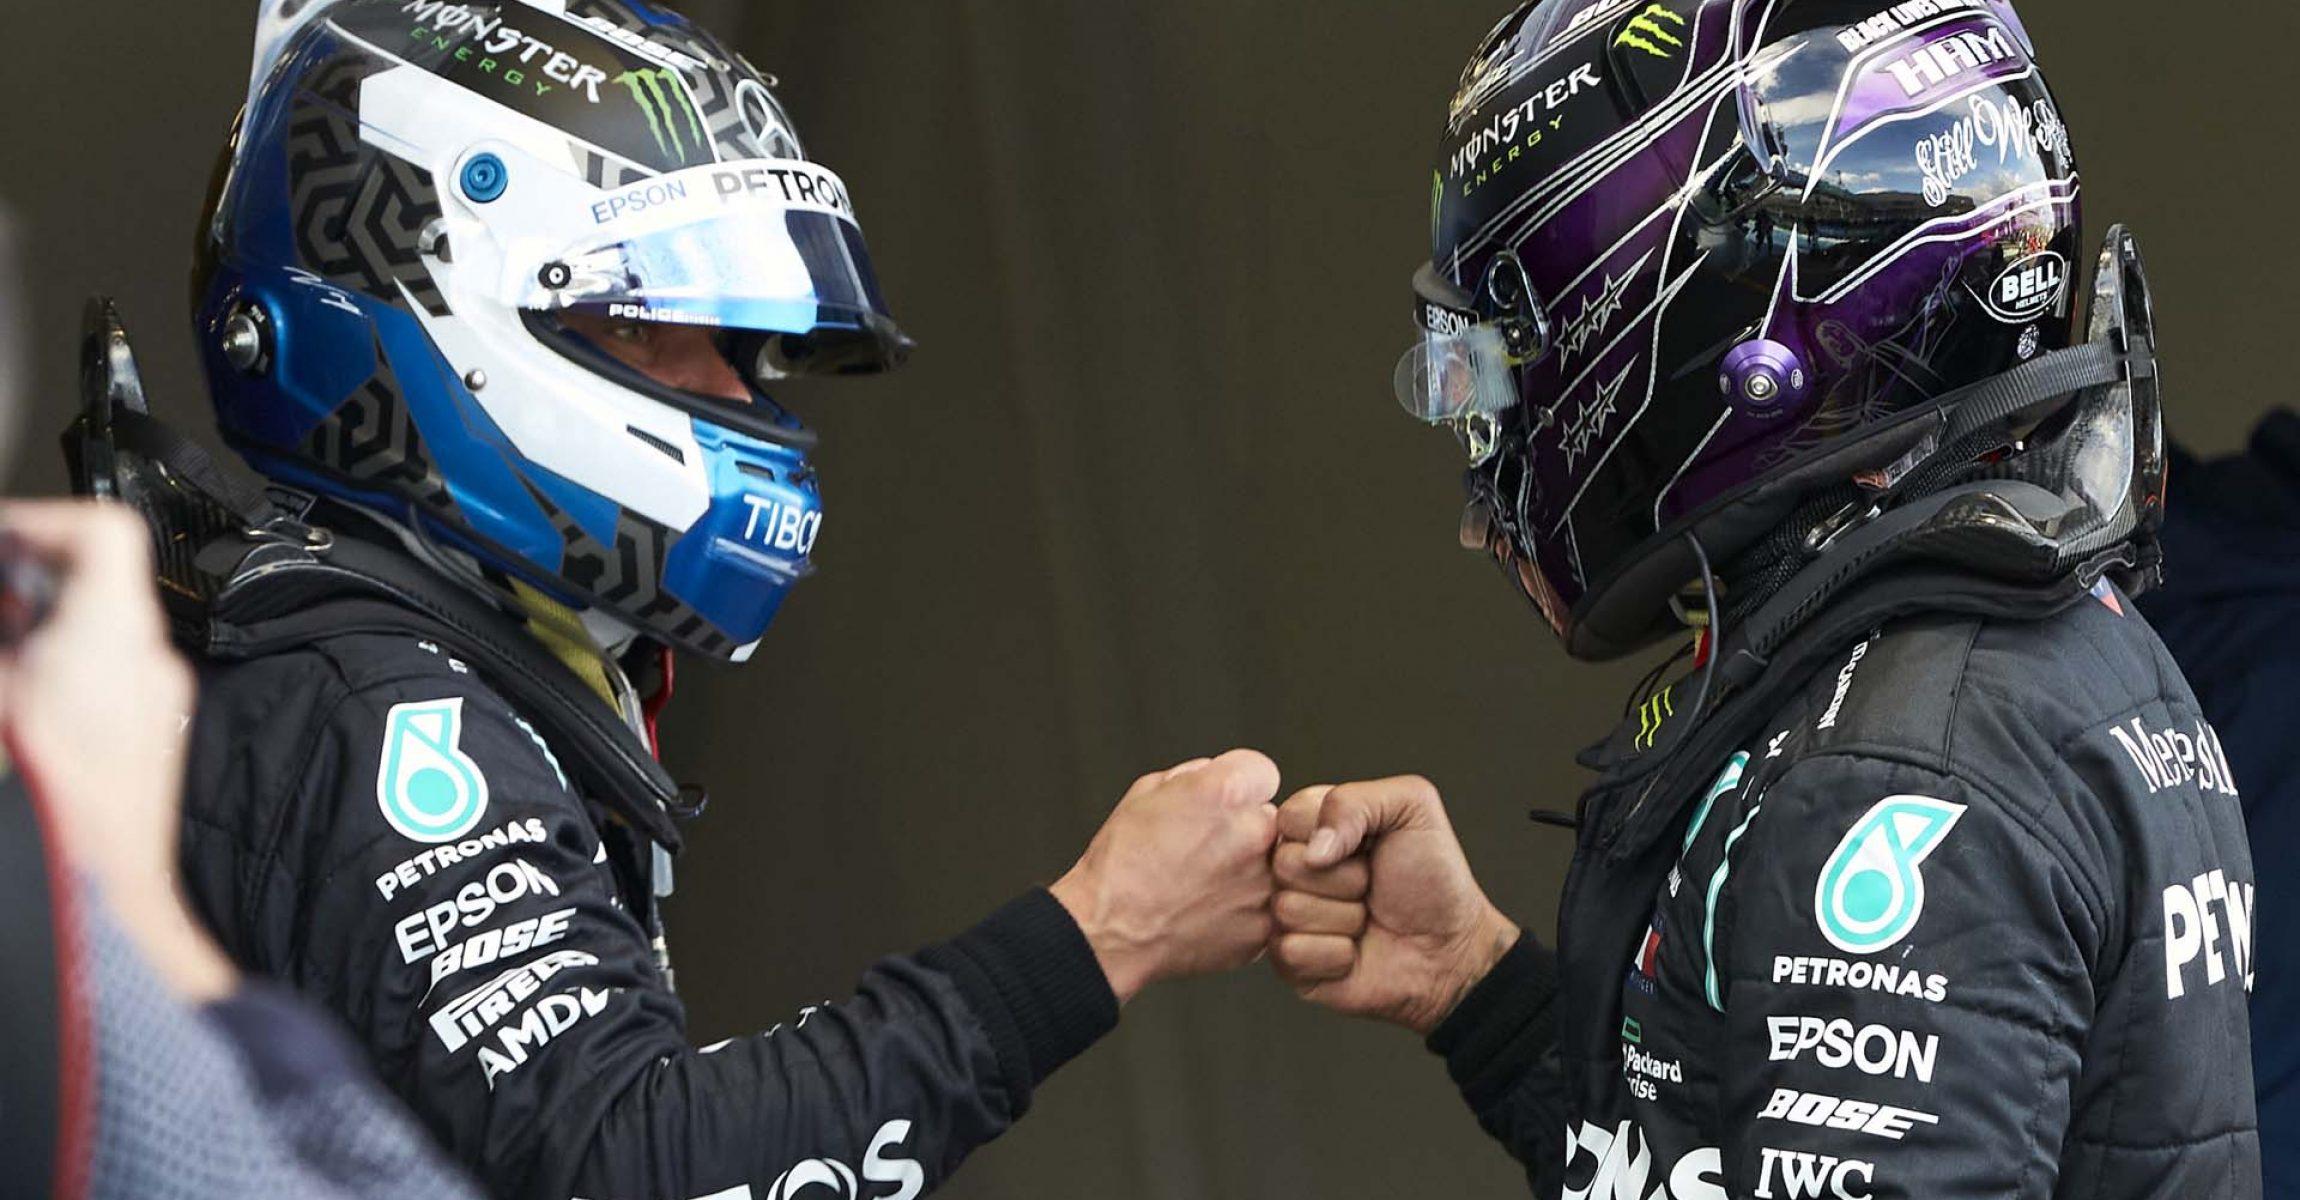 2020 Eifel Grand Prix, Saturday - Steve Etherington Valtteri Bottas Lewis Hamilton